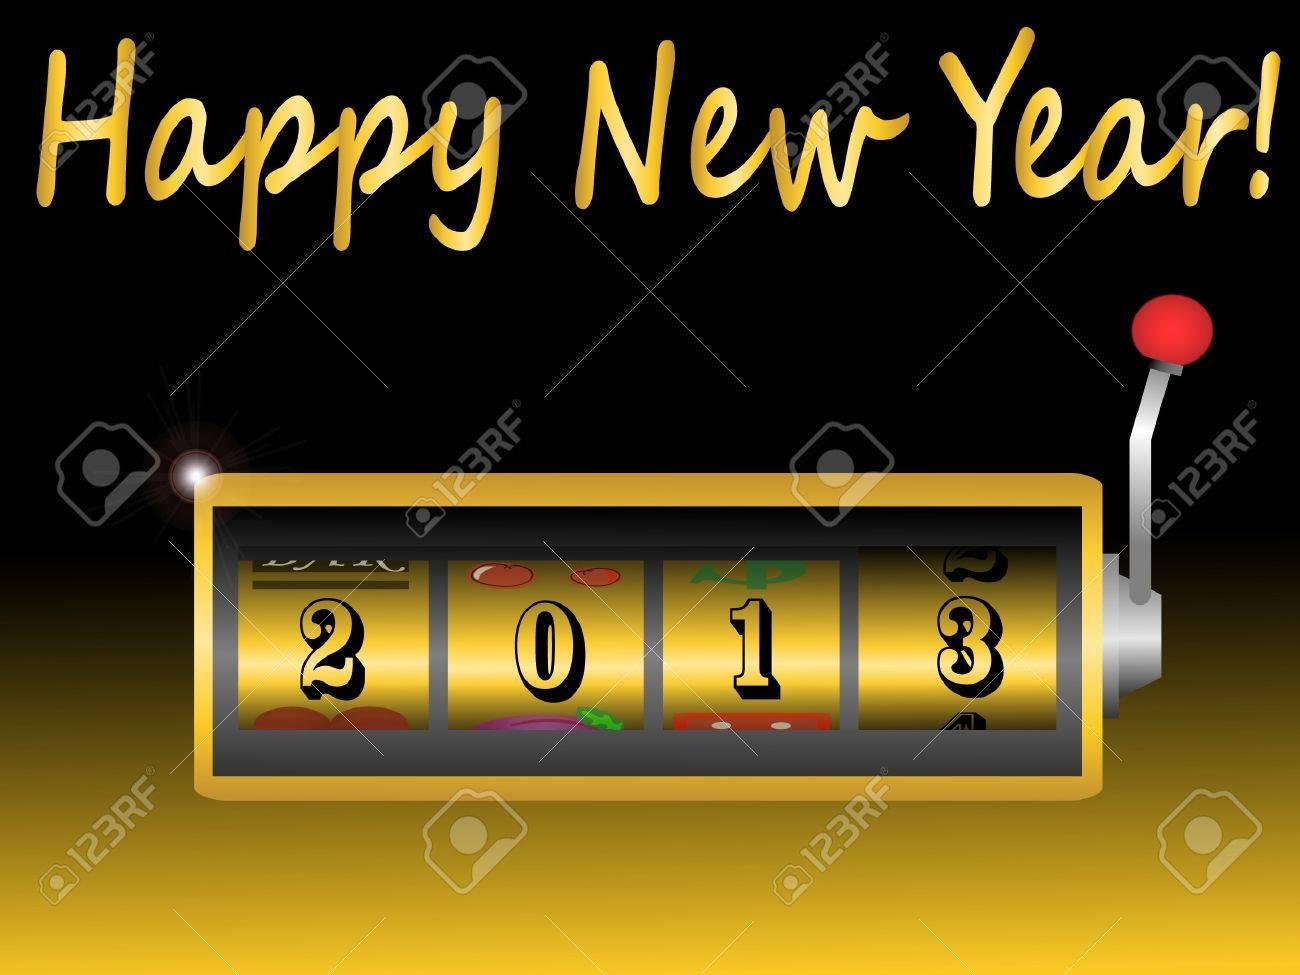 new year 2013 in slot machine vector illustration Stock Vector - 16270989